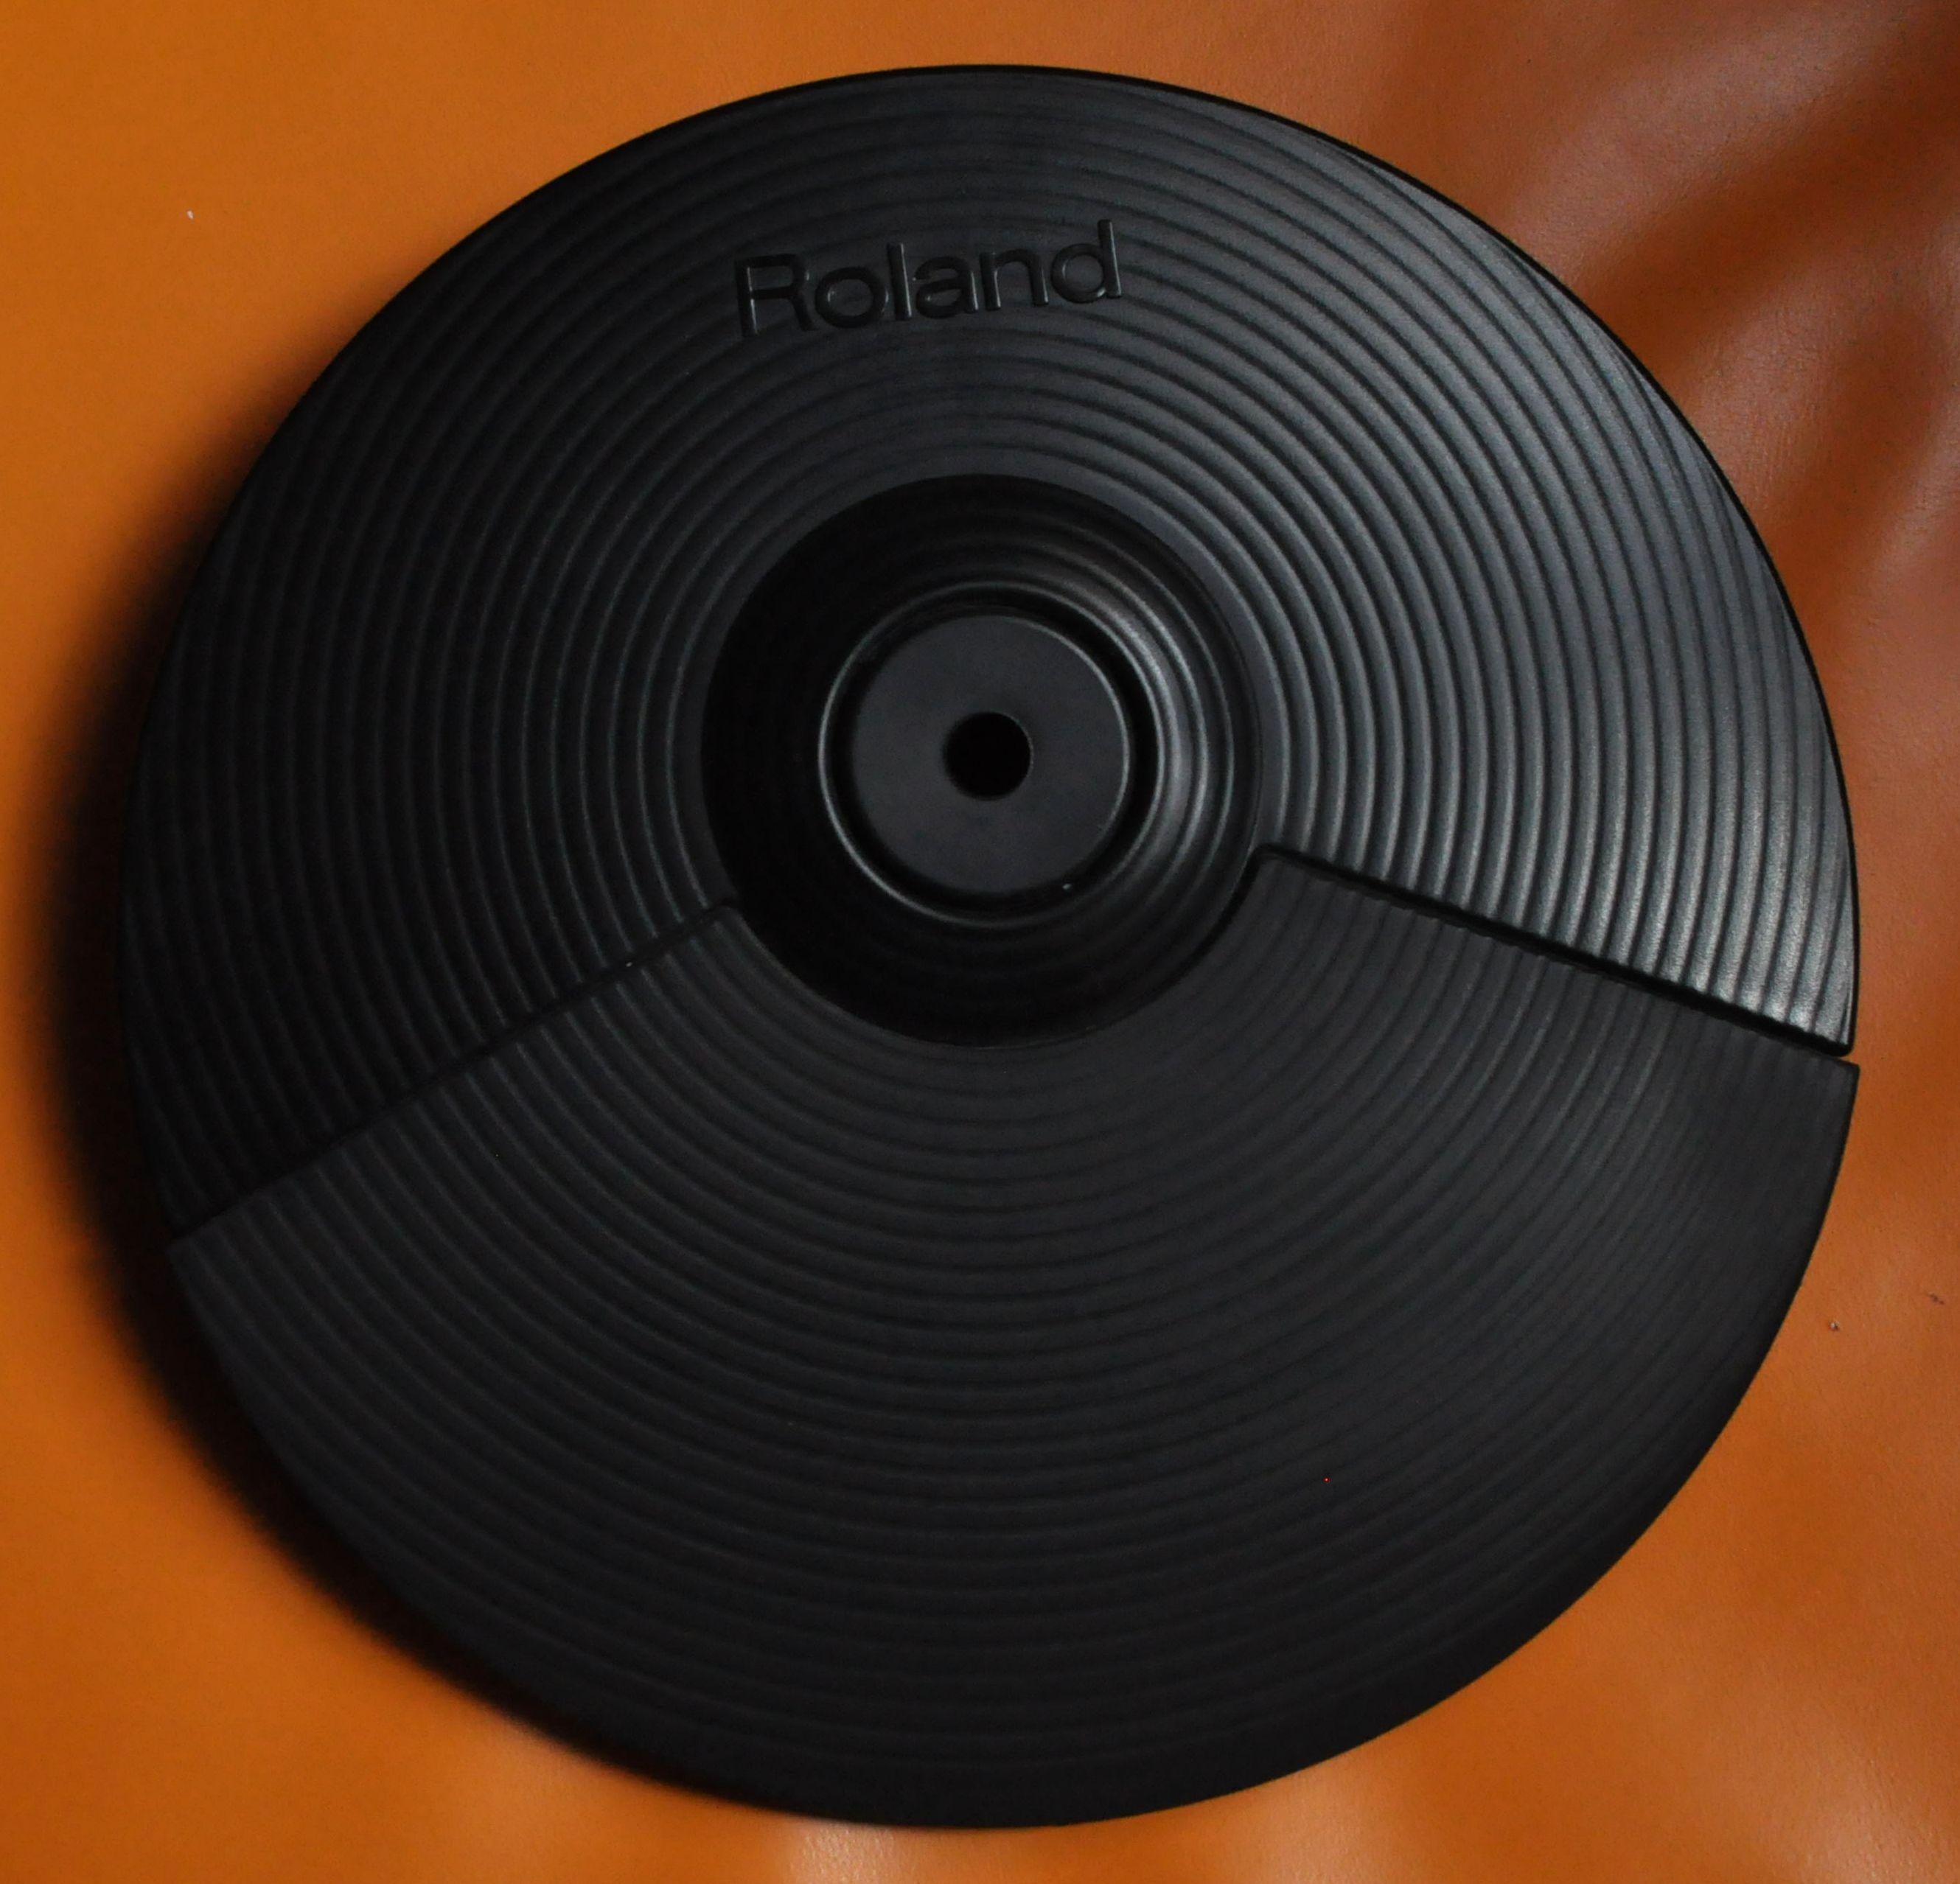 roland cy 5 image 1761268 audiofanzine. Black Bedroom Furniture Sets. Home Design Ideas